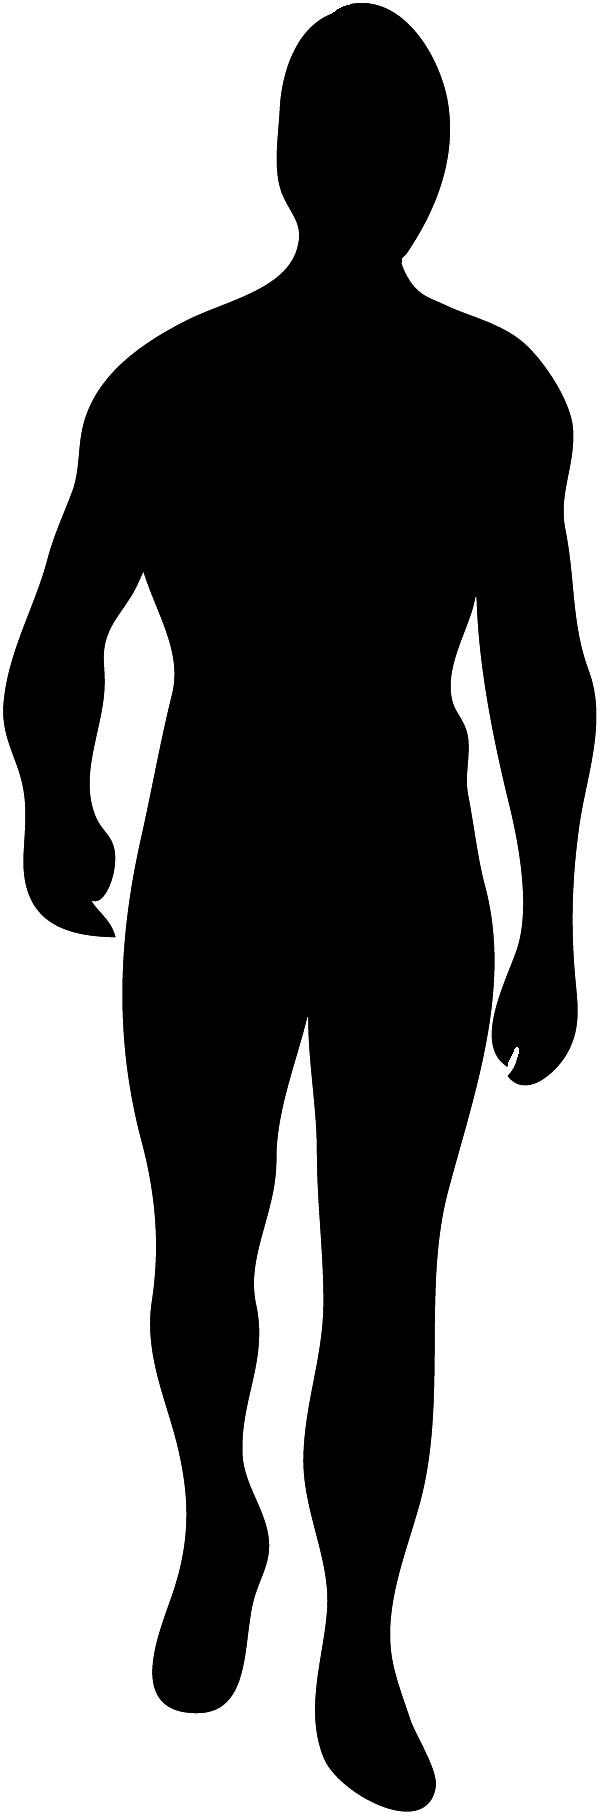 man's body silhouette